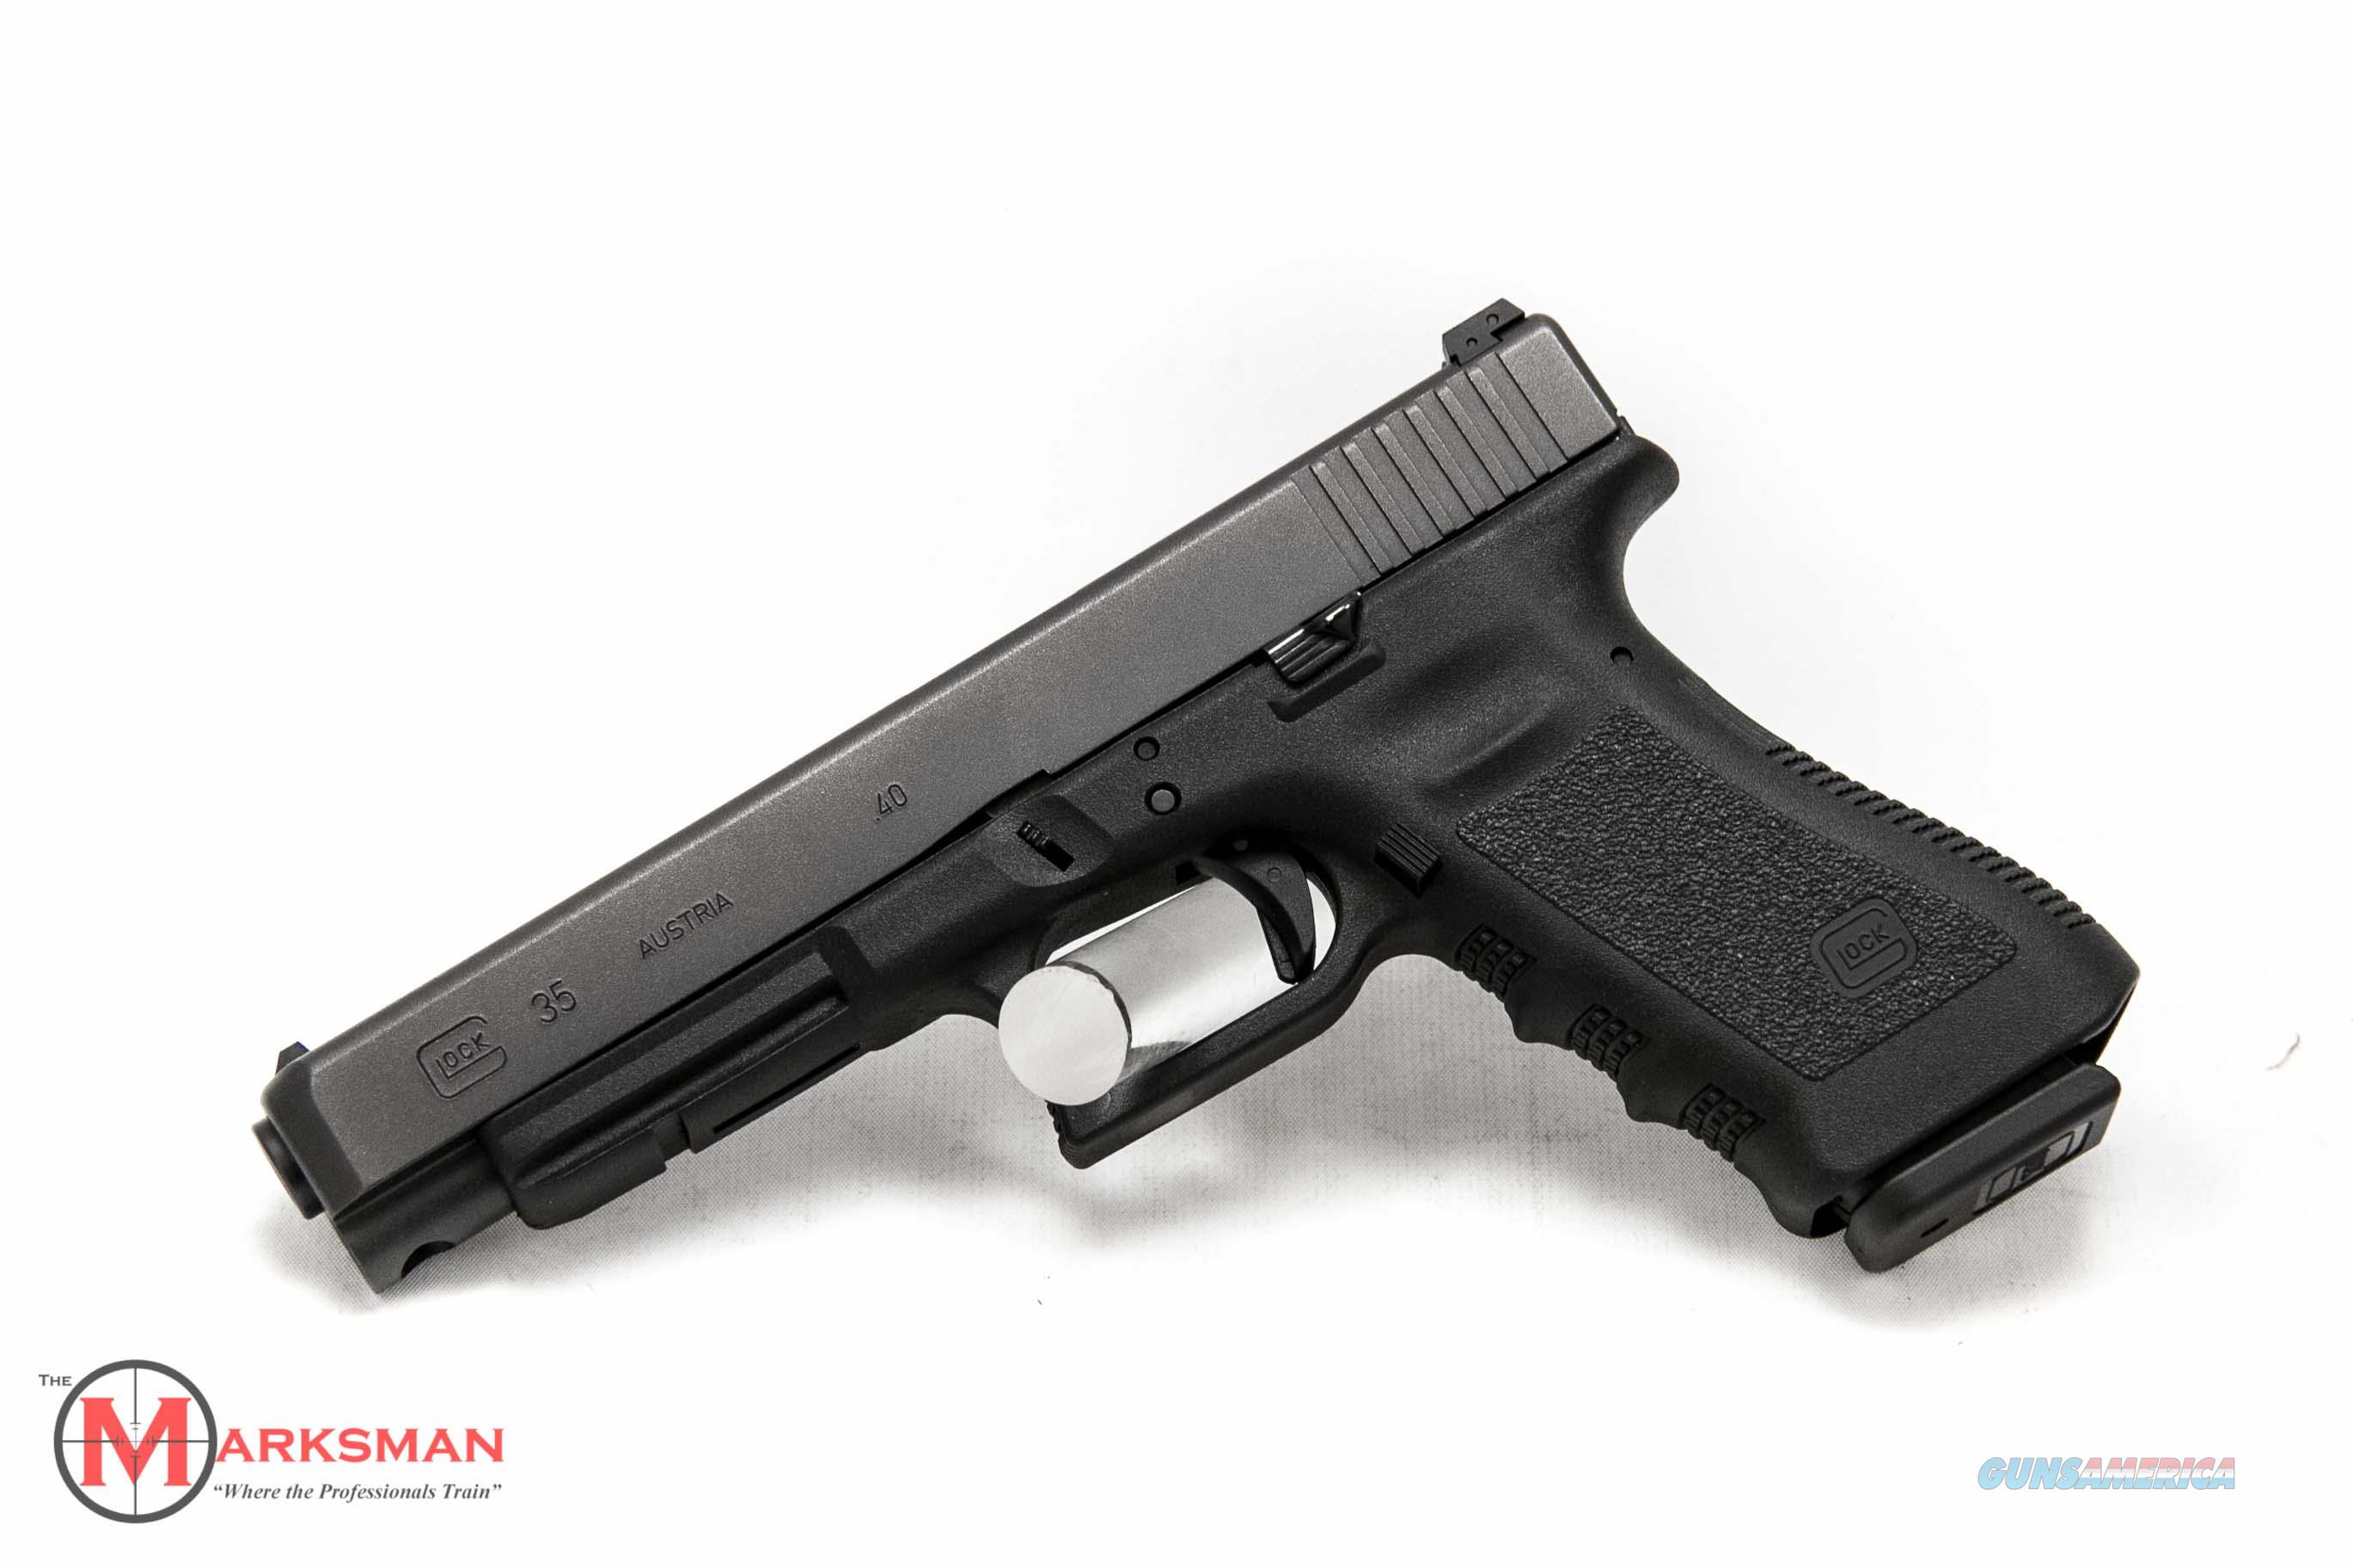 Glock 35 Generation 3 .40 S&W NEW  Guns > Pistols > Glock Pistols > 35